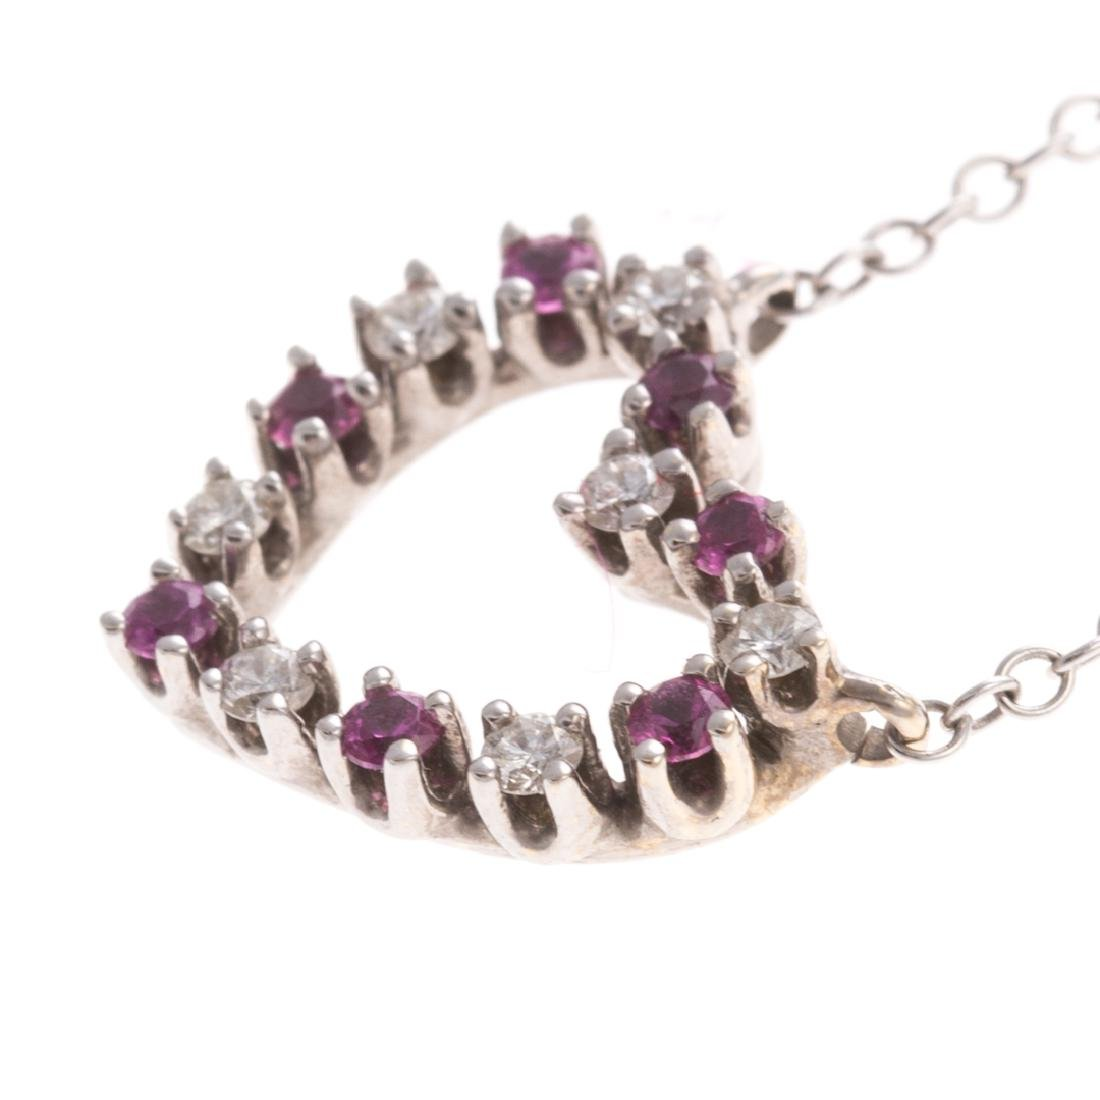 A Lady's Ruby & Diamond Heart Necklace in 18K - 2